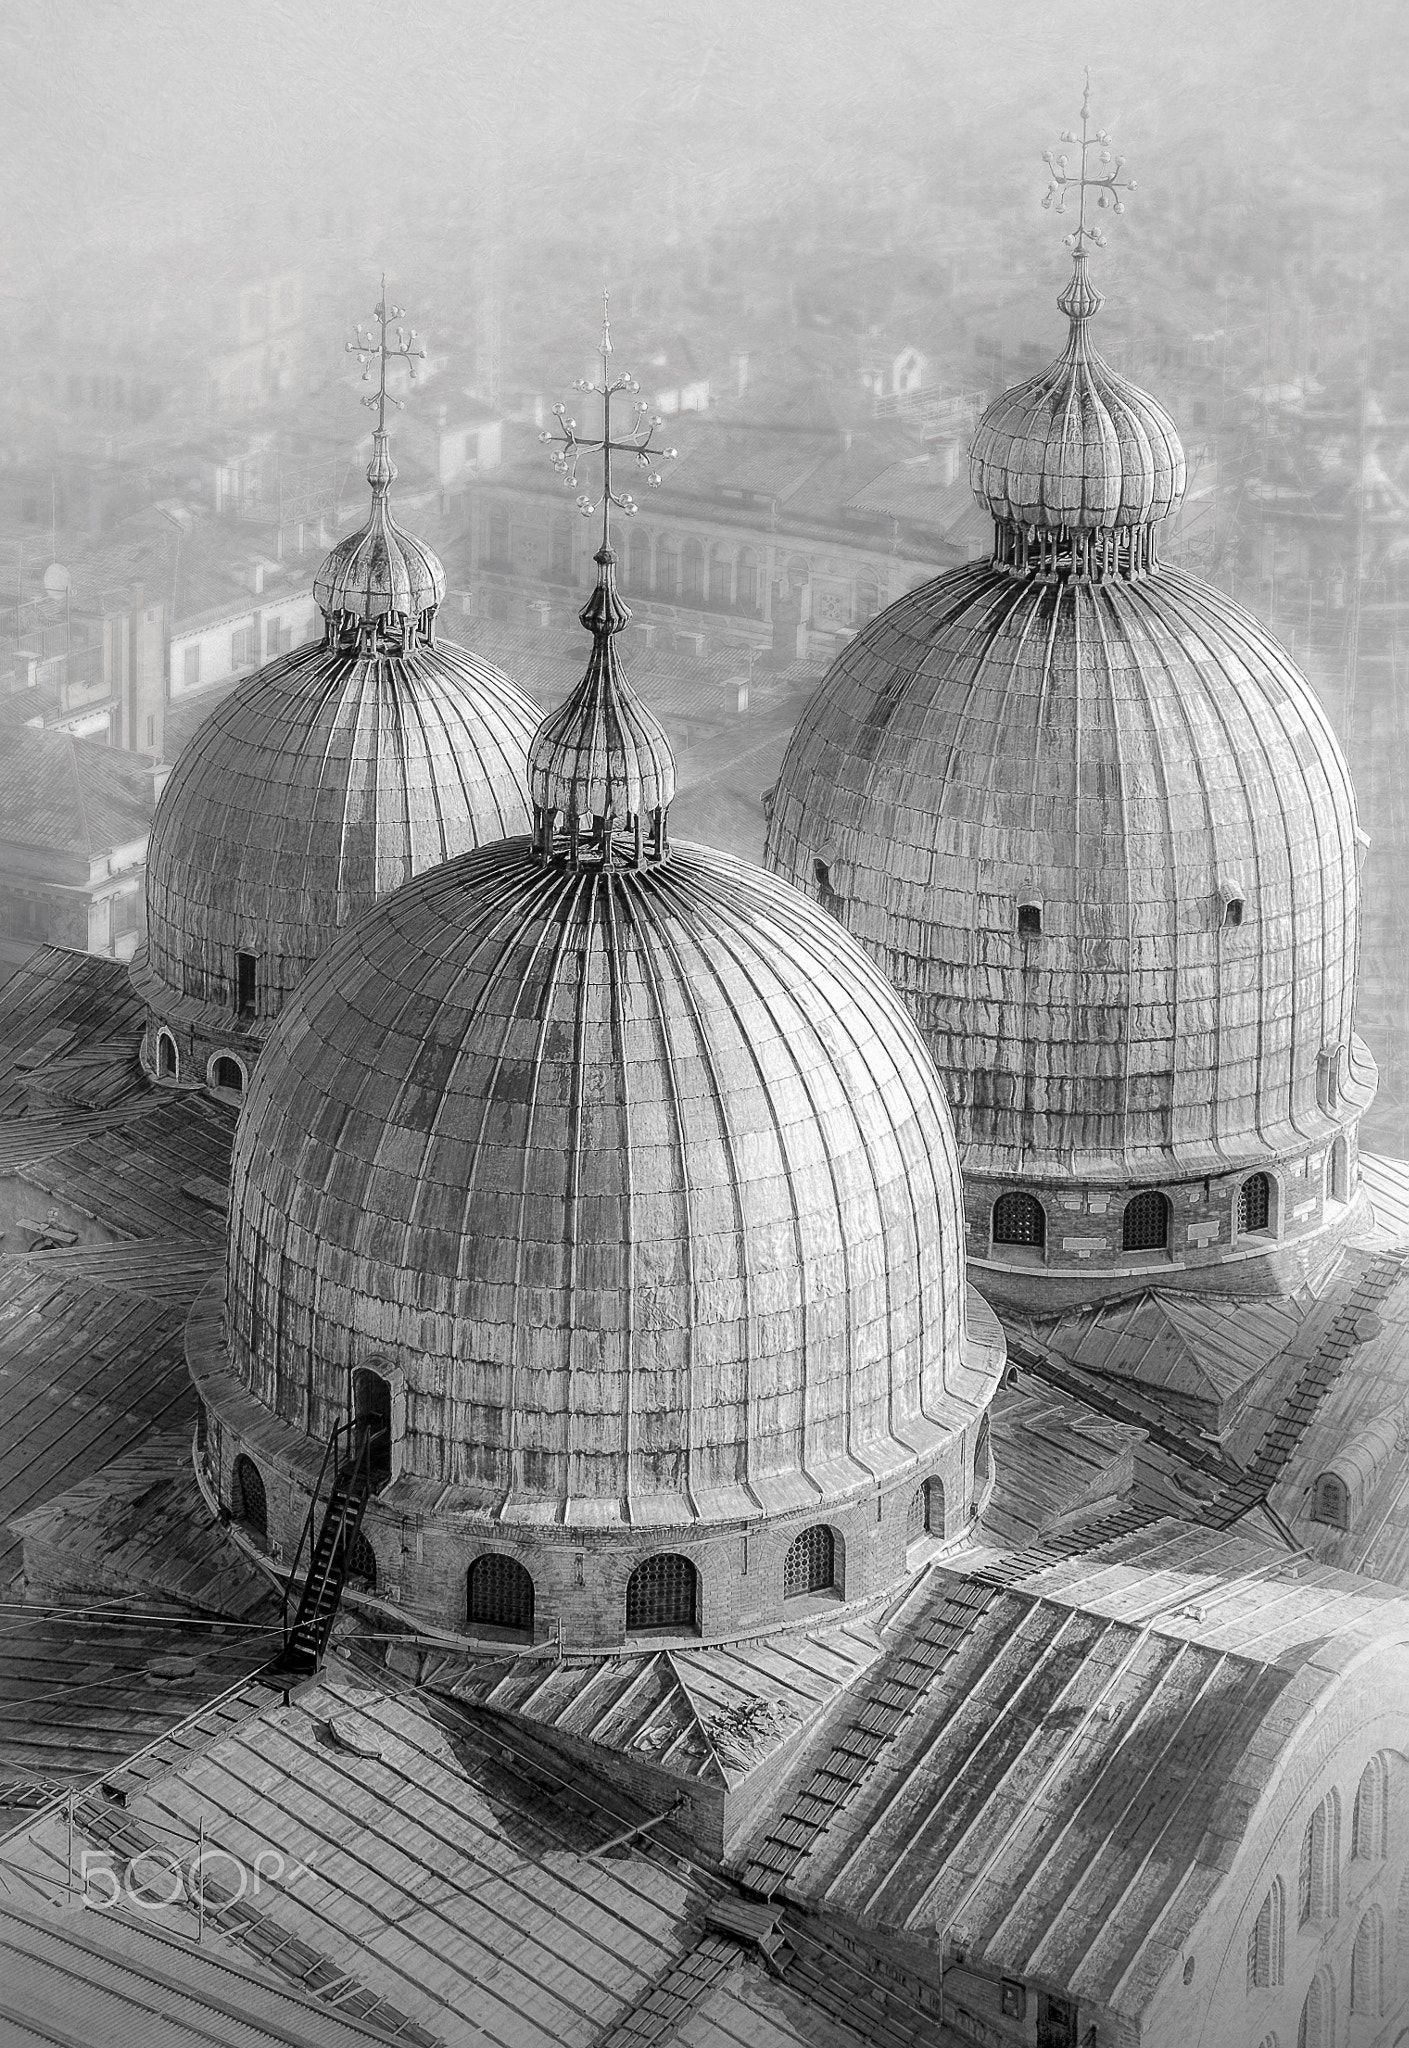 Basilica Di San Marco Venice Basilica Di San Marco As Seen From The Campanile Di San Marco San Marco Venice Basilica